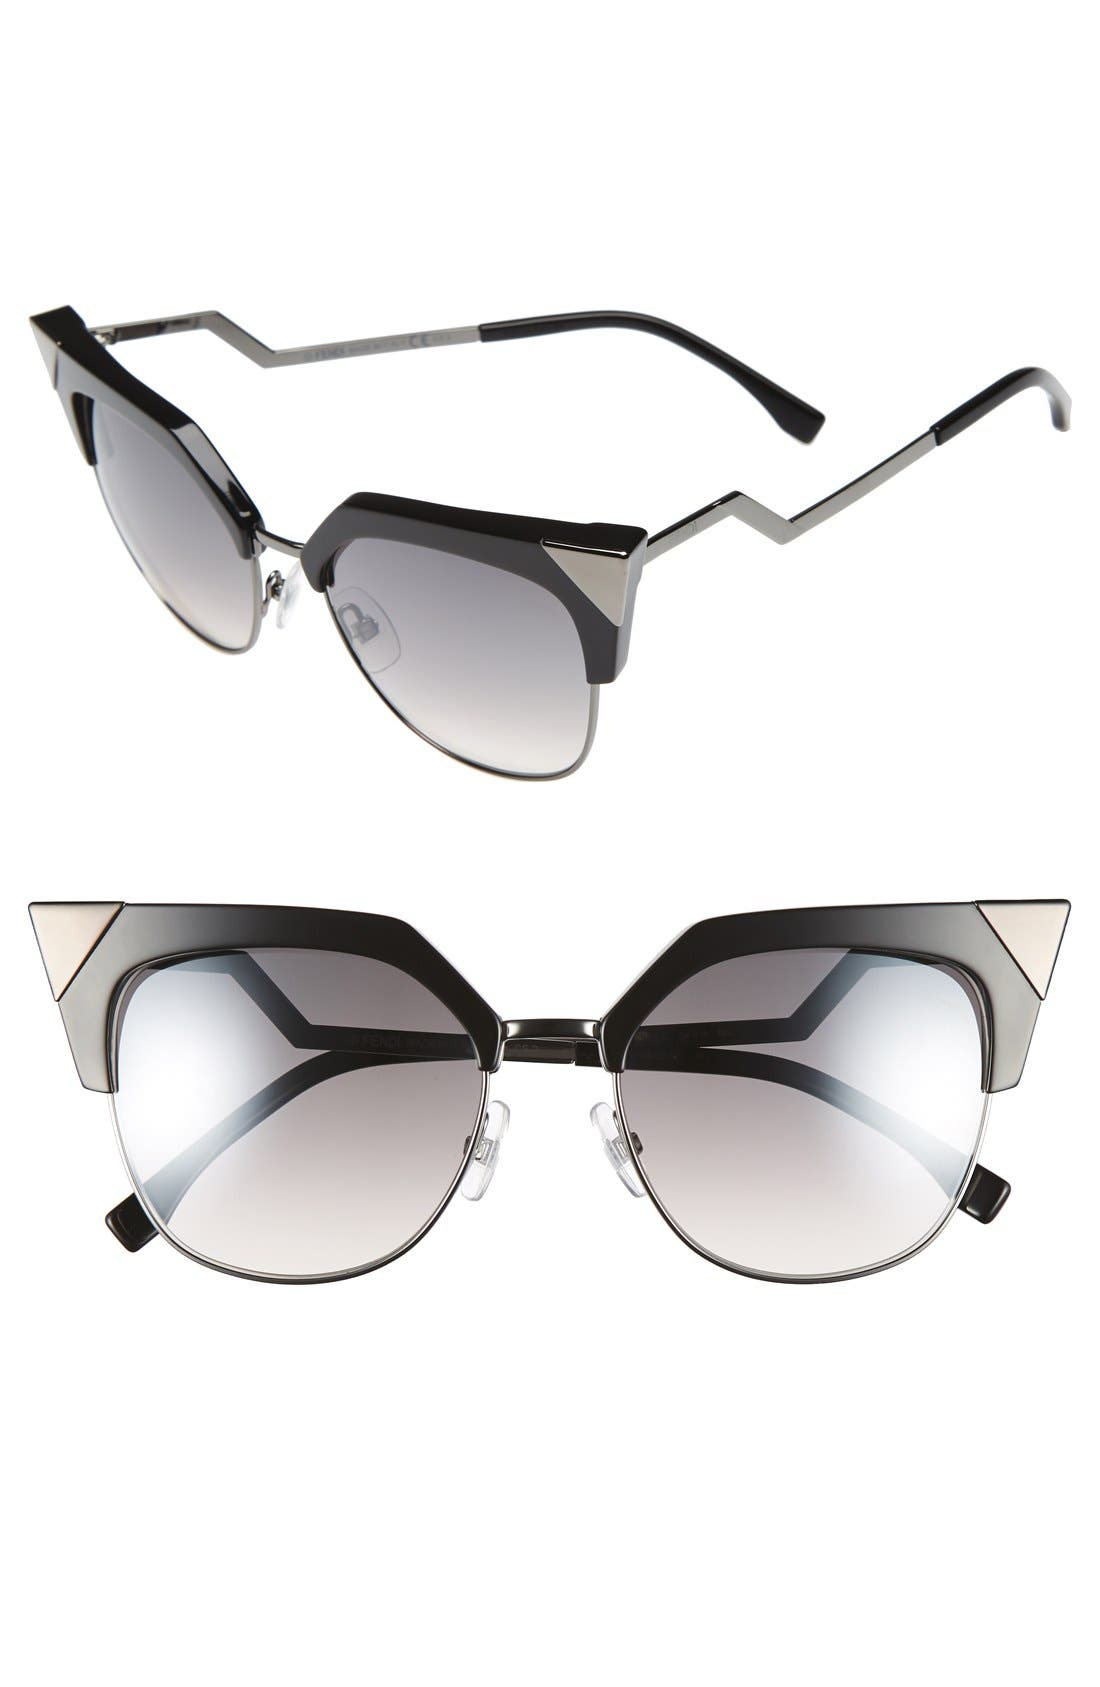 Main Image - Fendi 54mm Metal Tipped Cat Eye Sunglasses